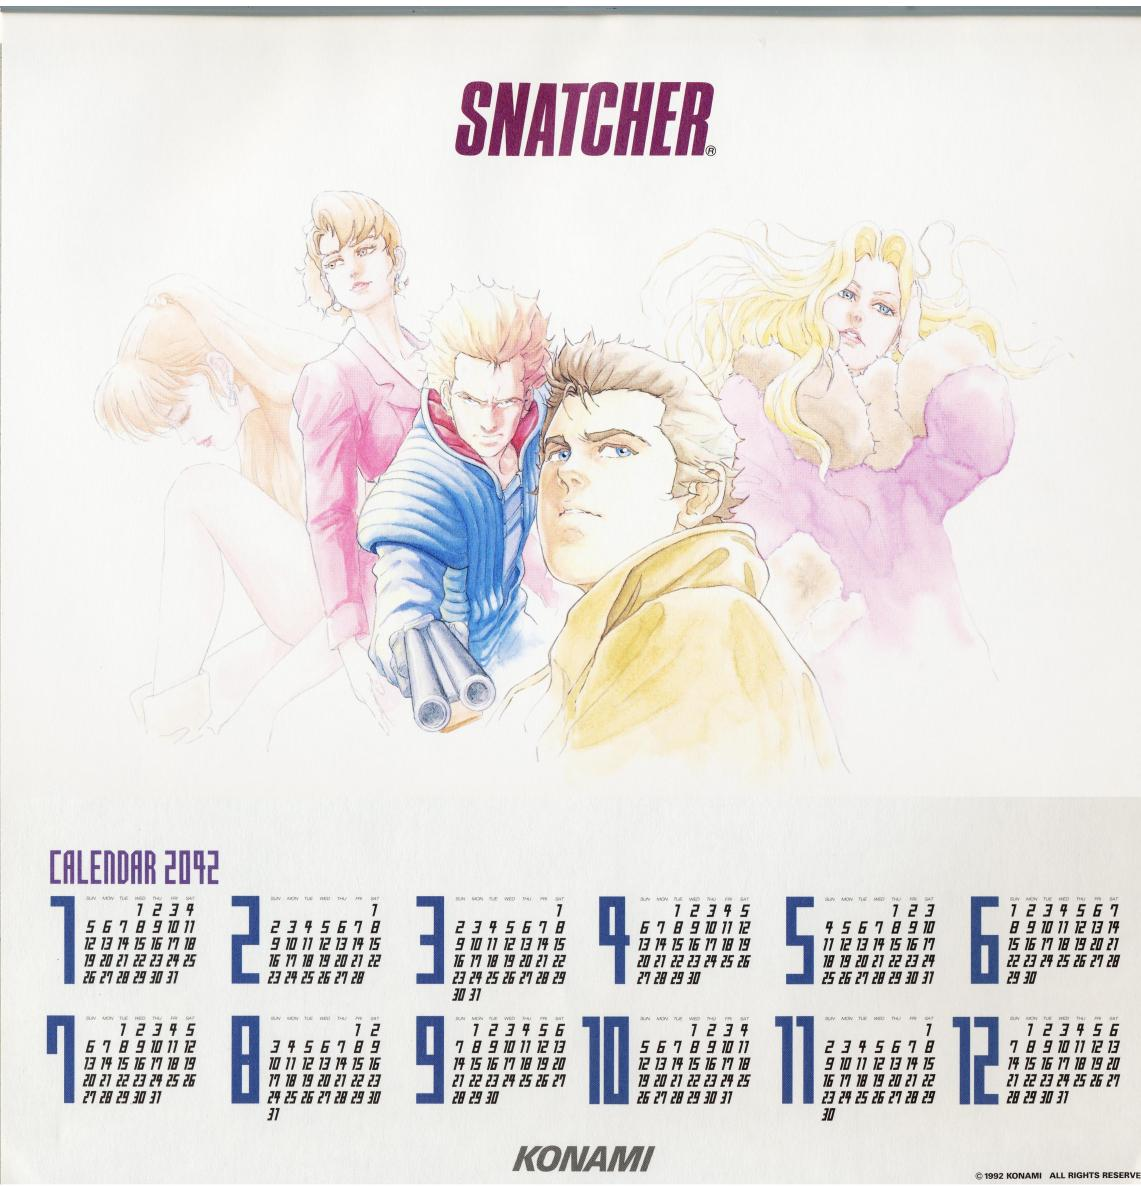 Konami Personnel Department Snatcher Calendar